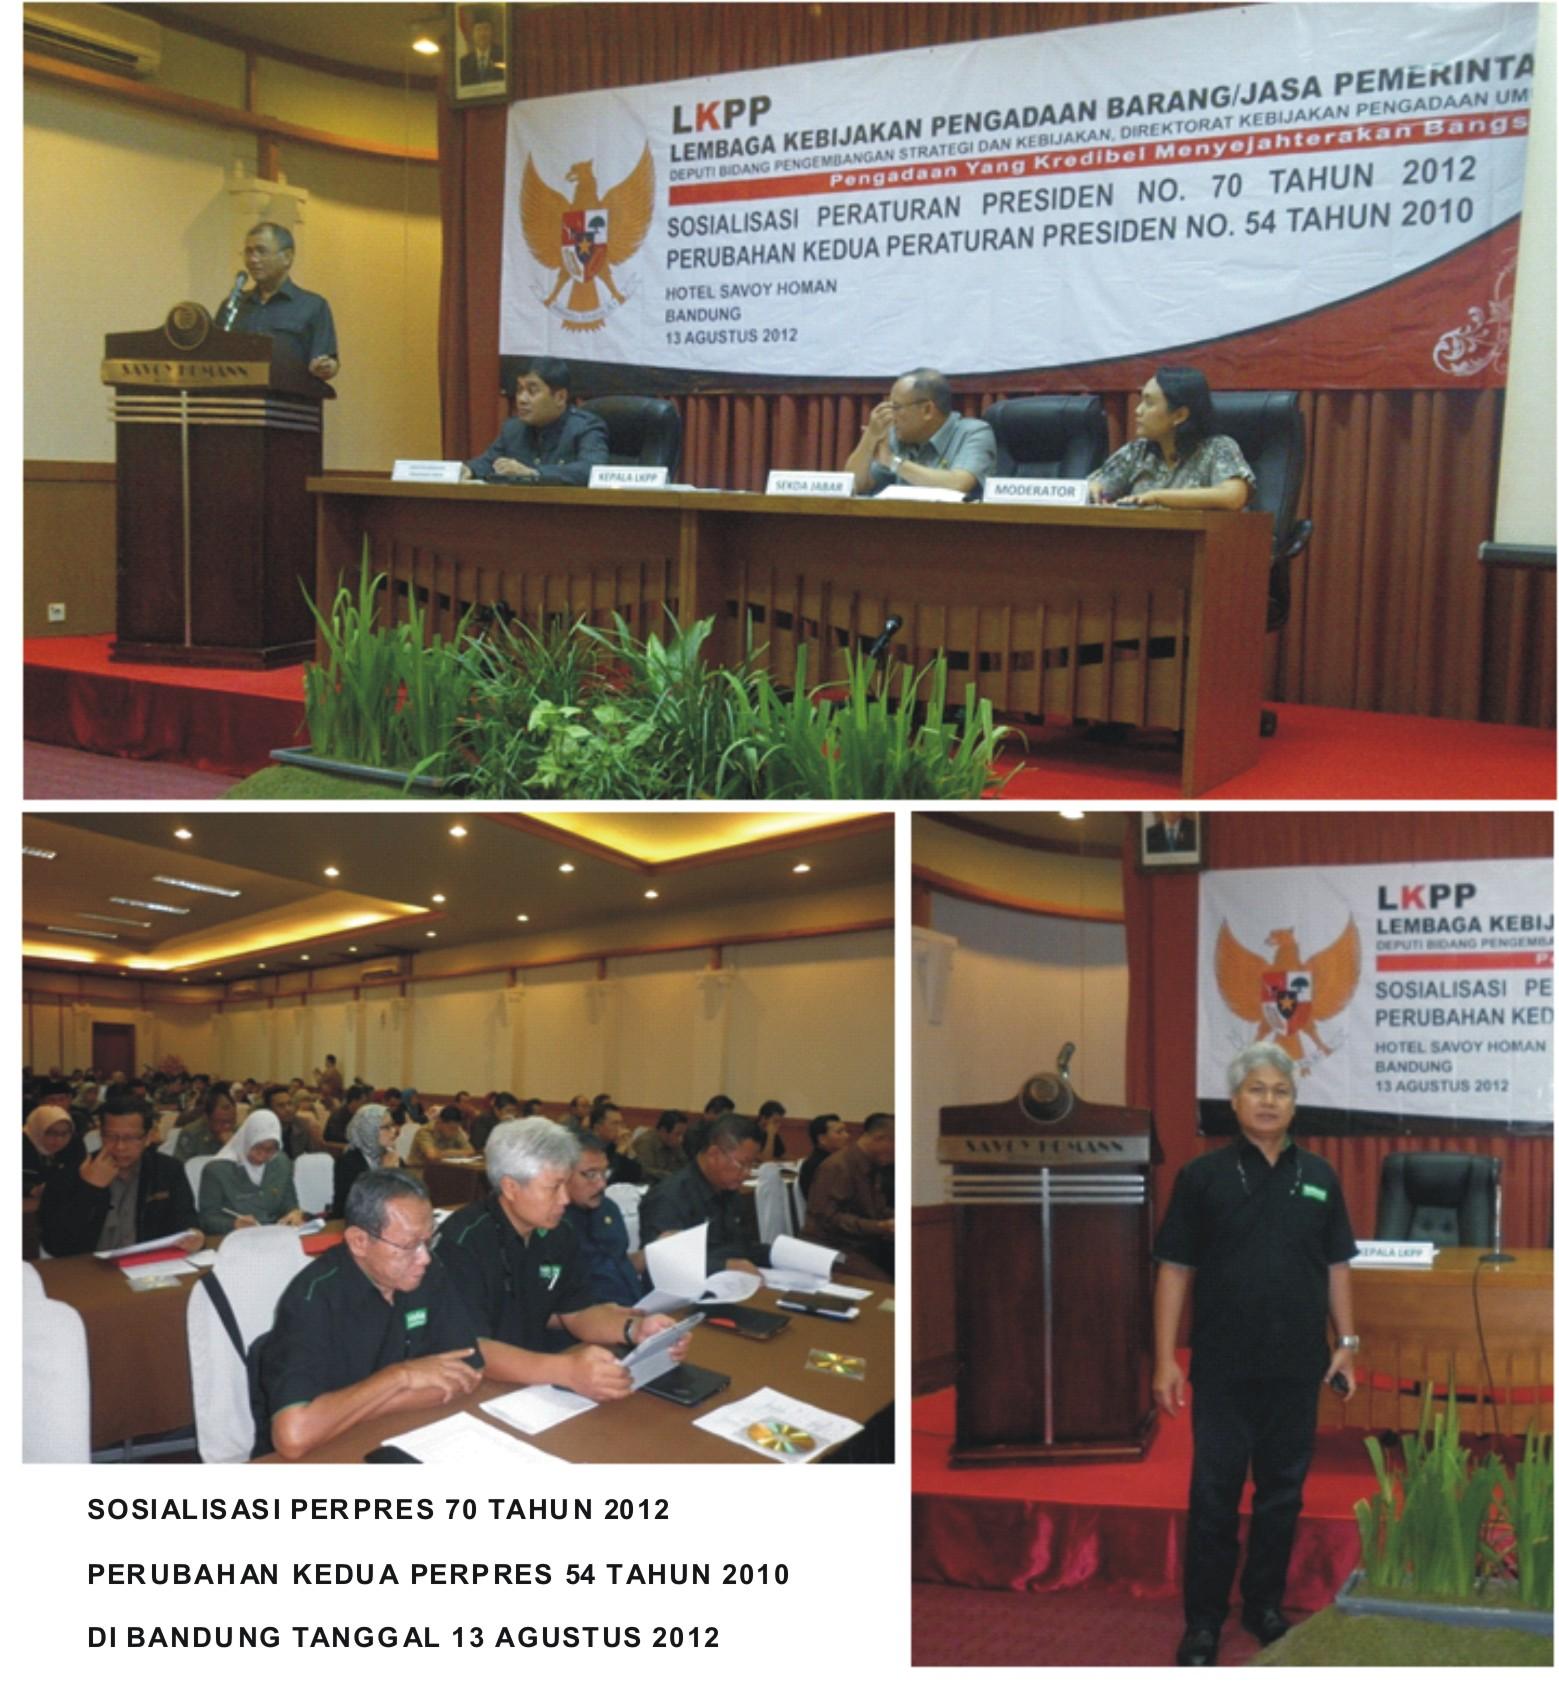 Sosialisasi Perpres 70 di Bandung